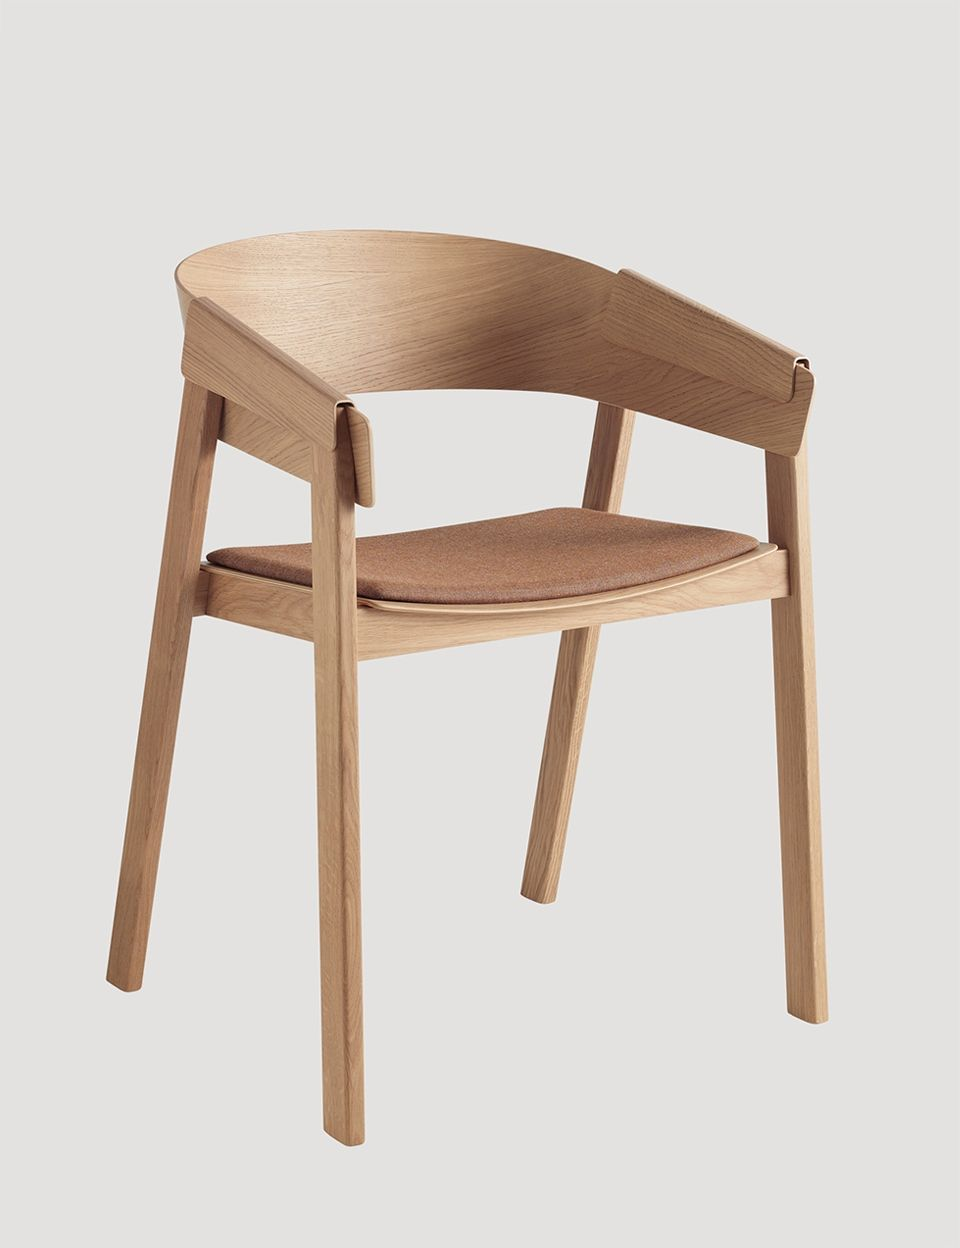 Cover Textile Furniture Furniture Design Scandinavian Chairs